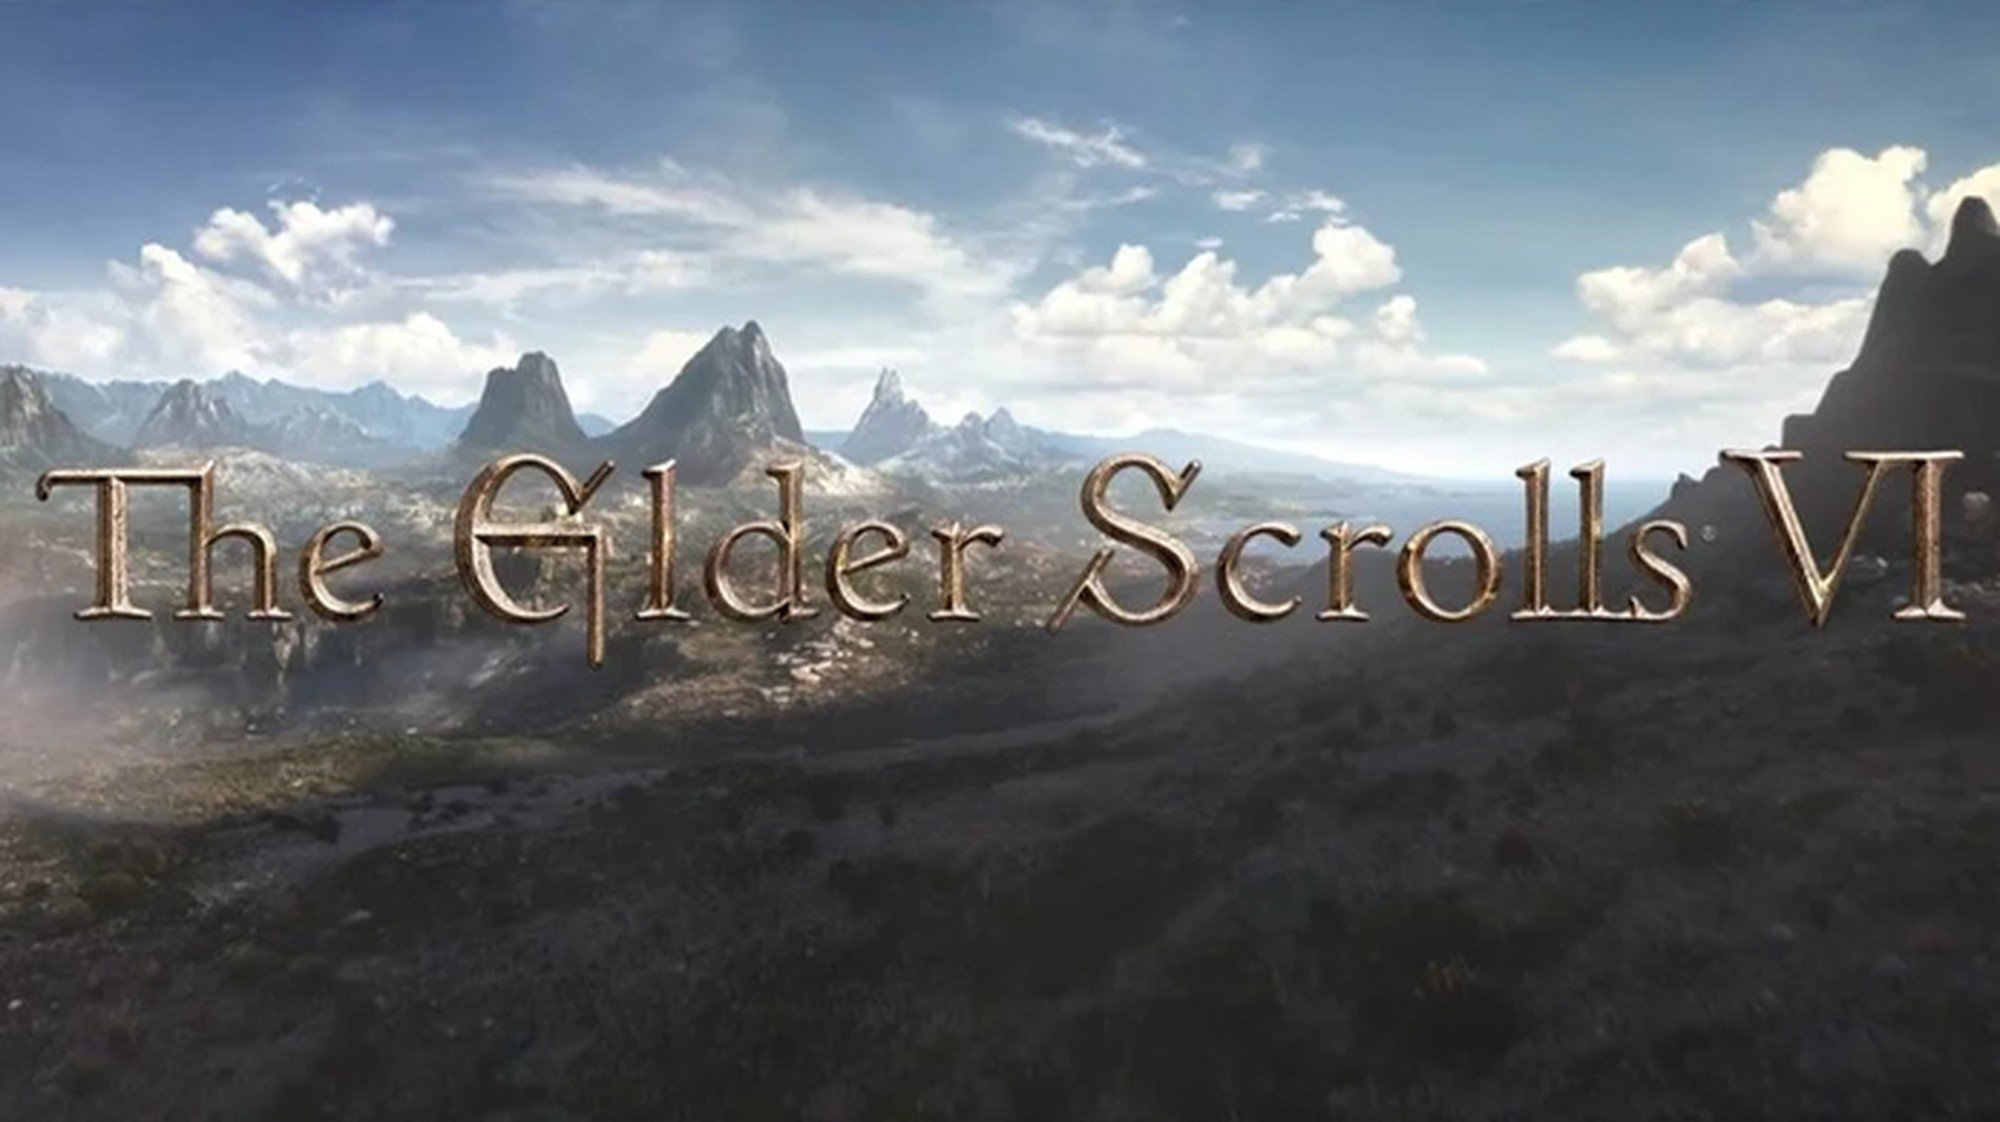 Bethesda says 'Elder Scrolls 6' details are years away